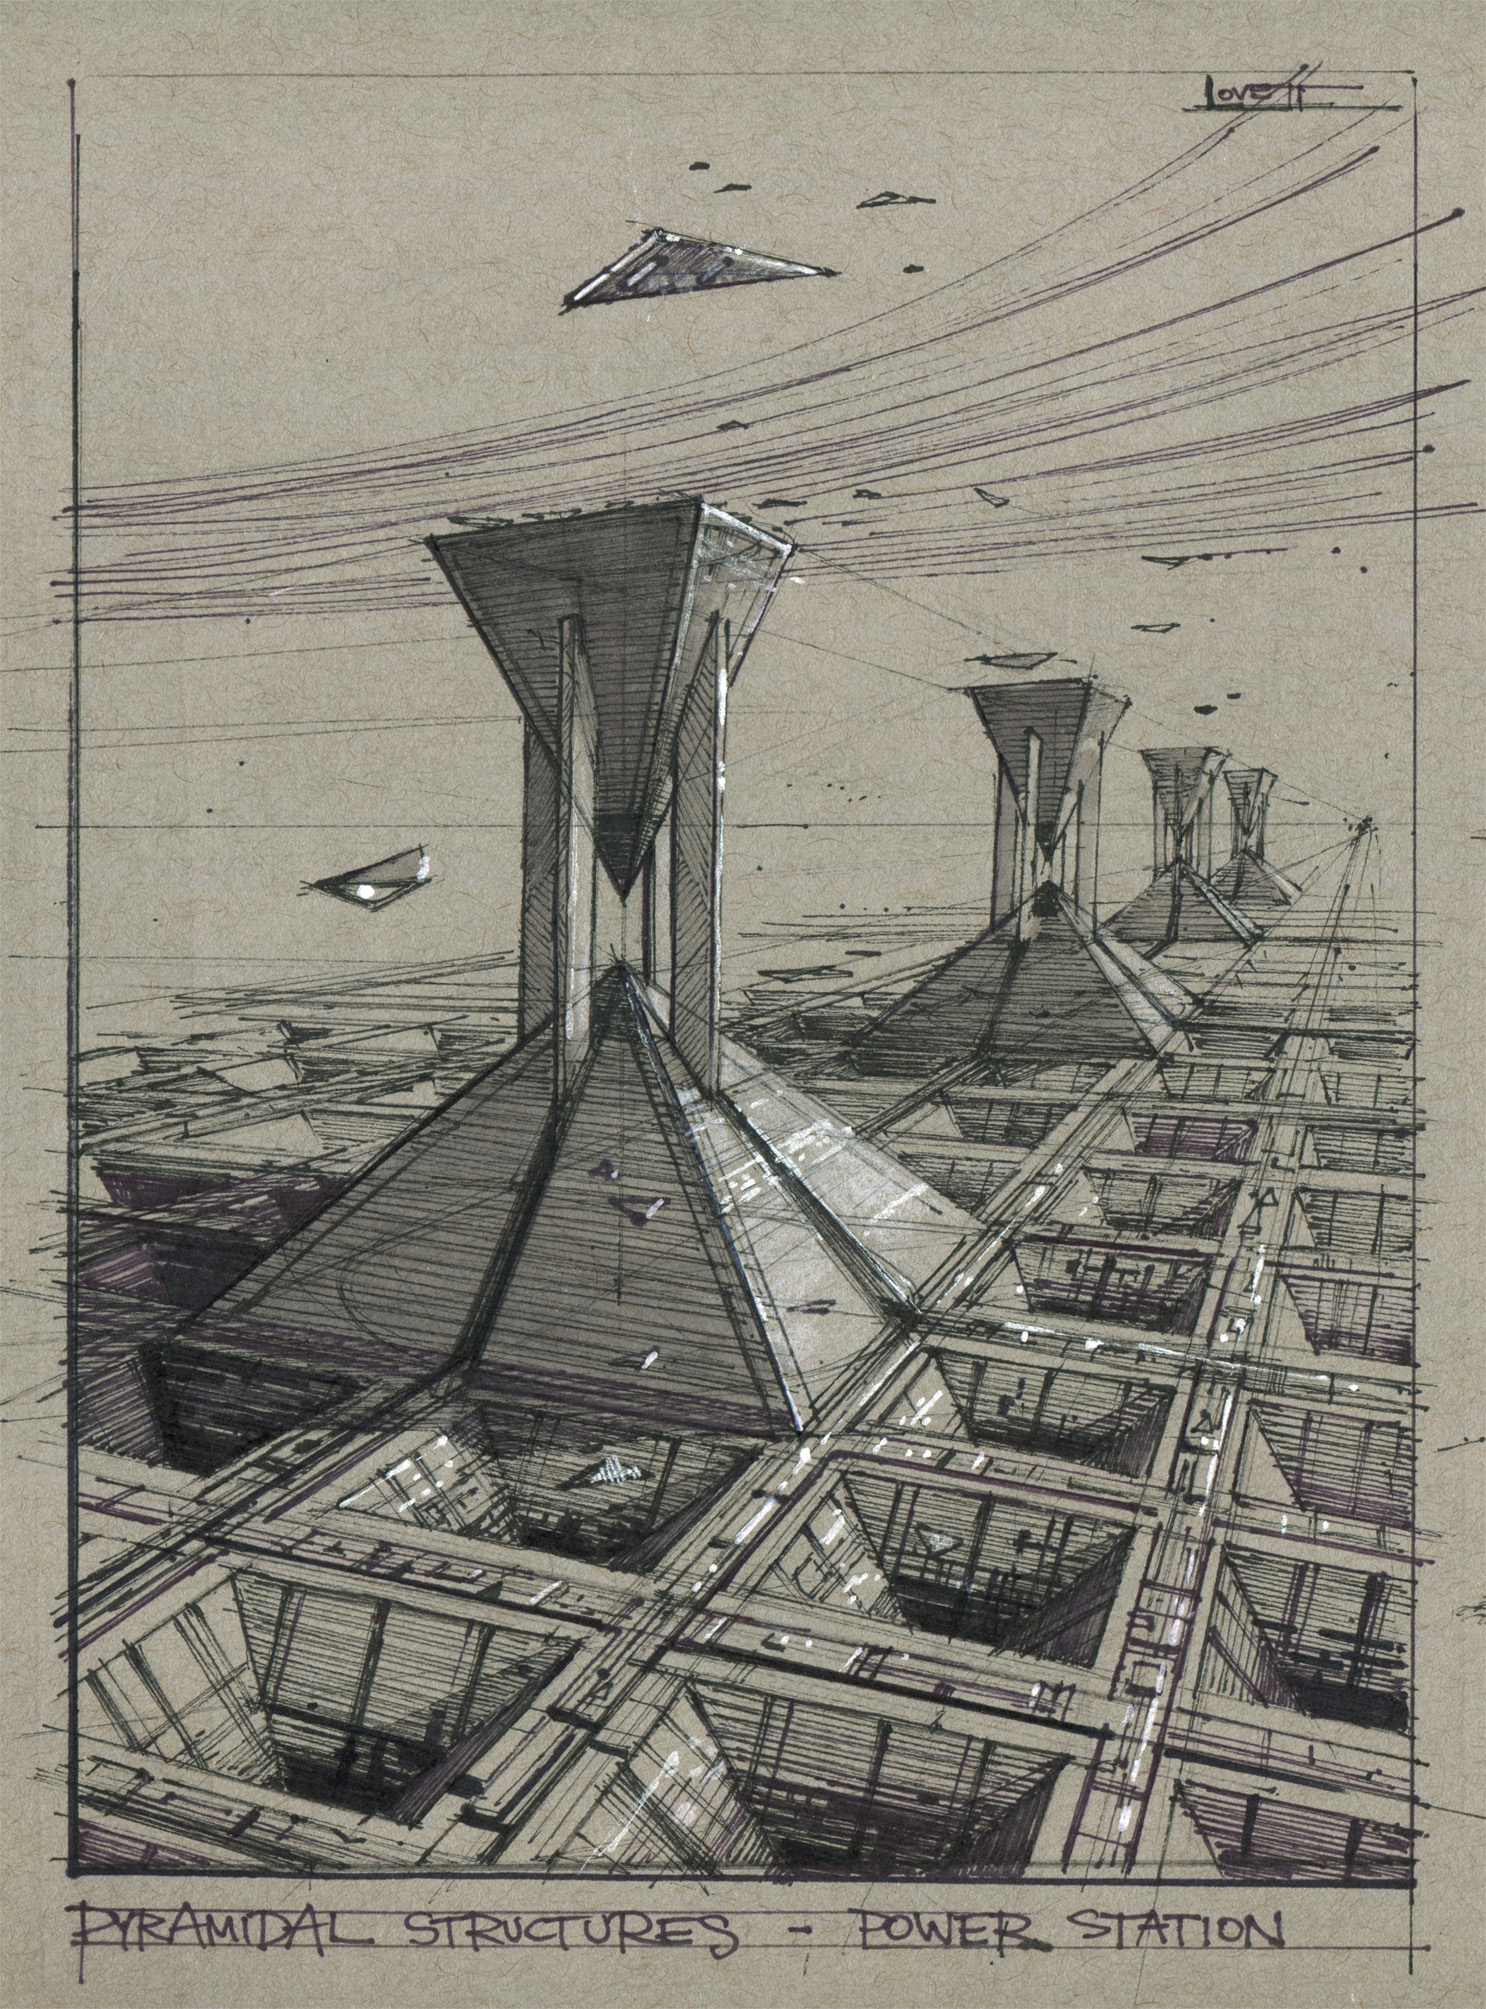 PyramidalStructures_TonyLovett